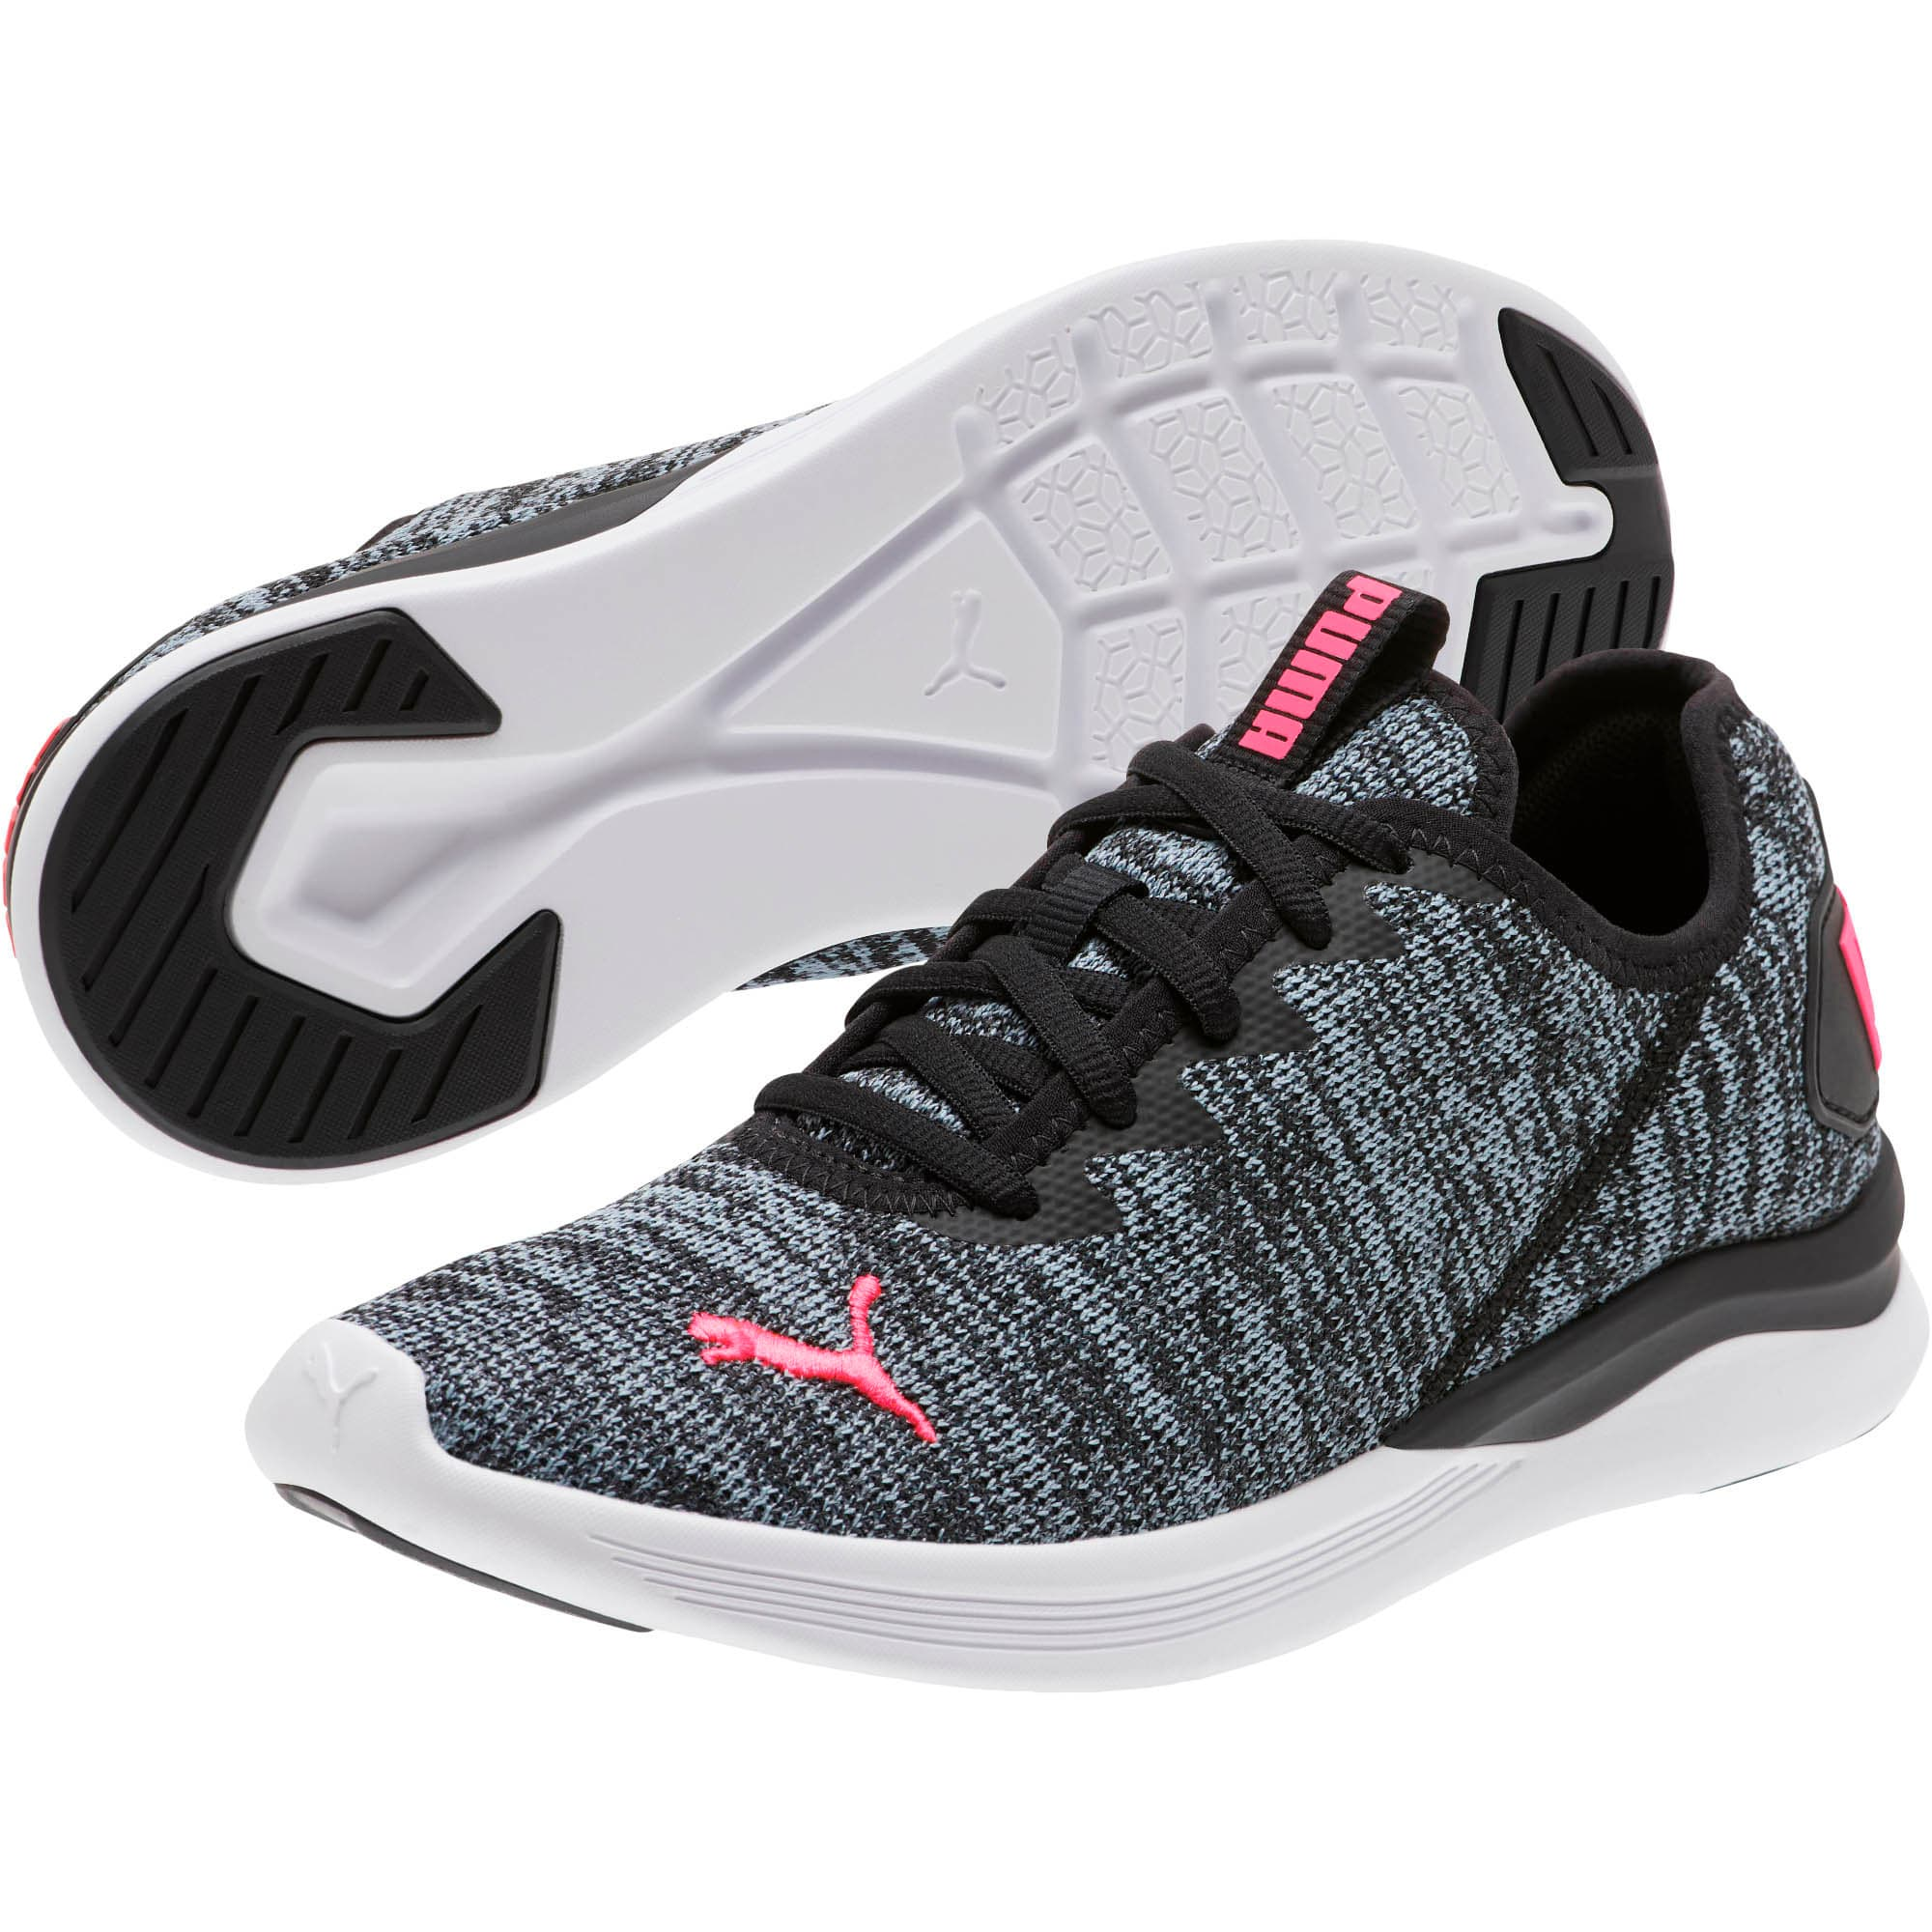 Thumbnail 2 of Ballast Women's Running Shoes, Puma Black-Pink Alert, medium